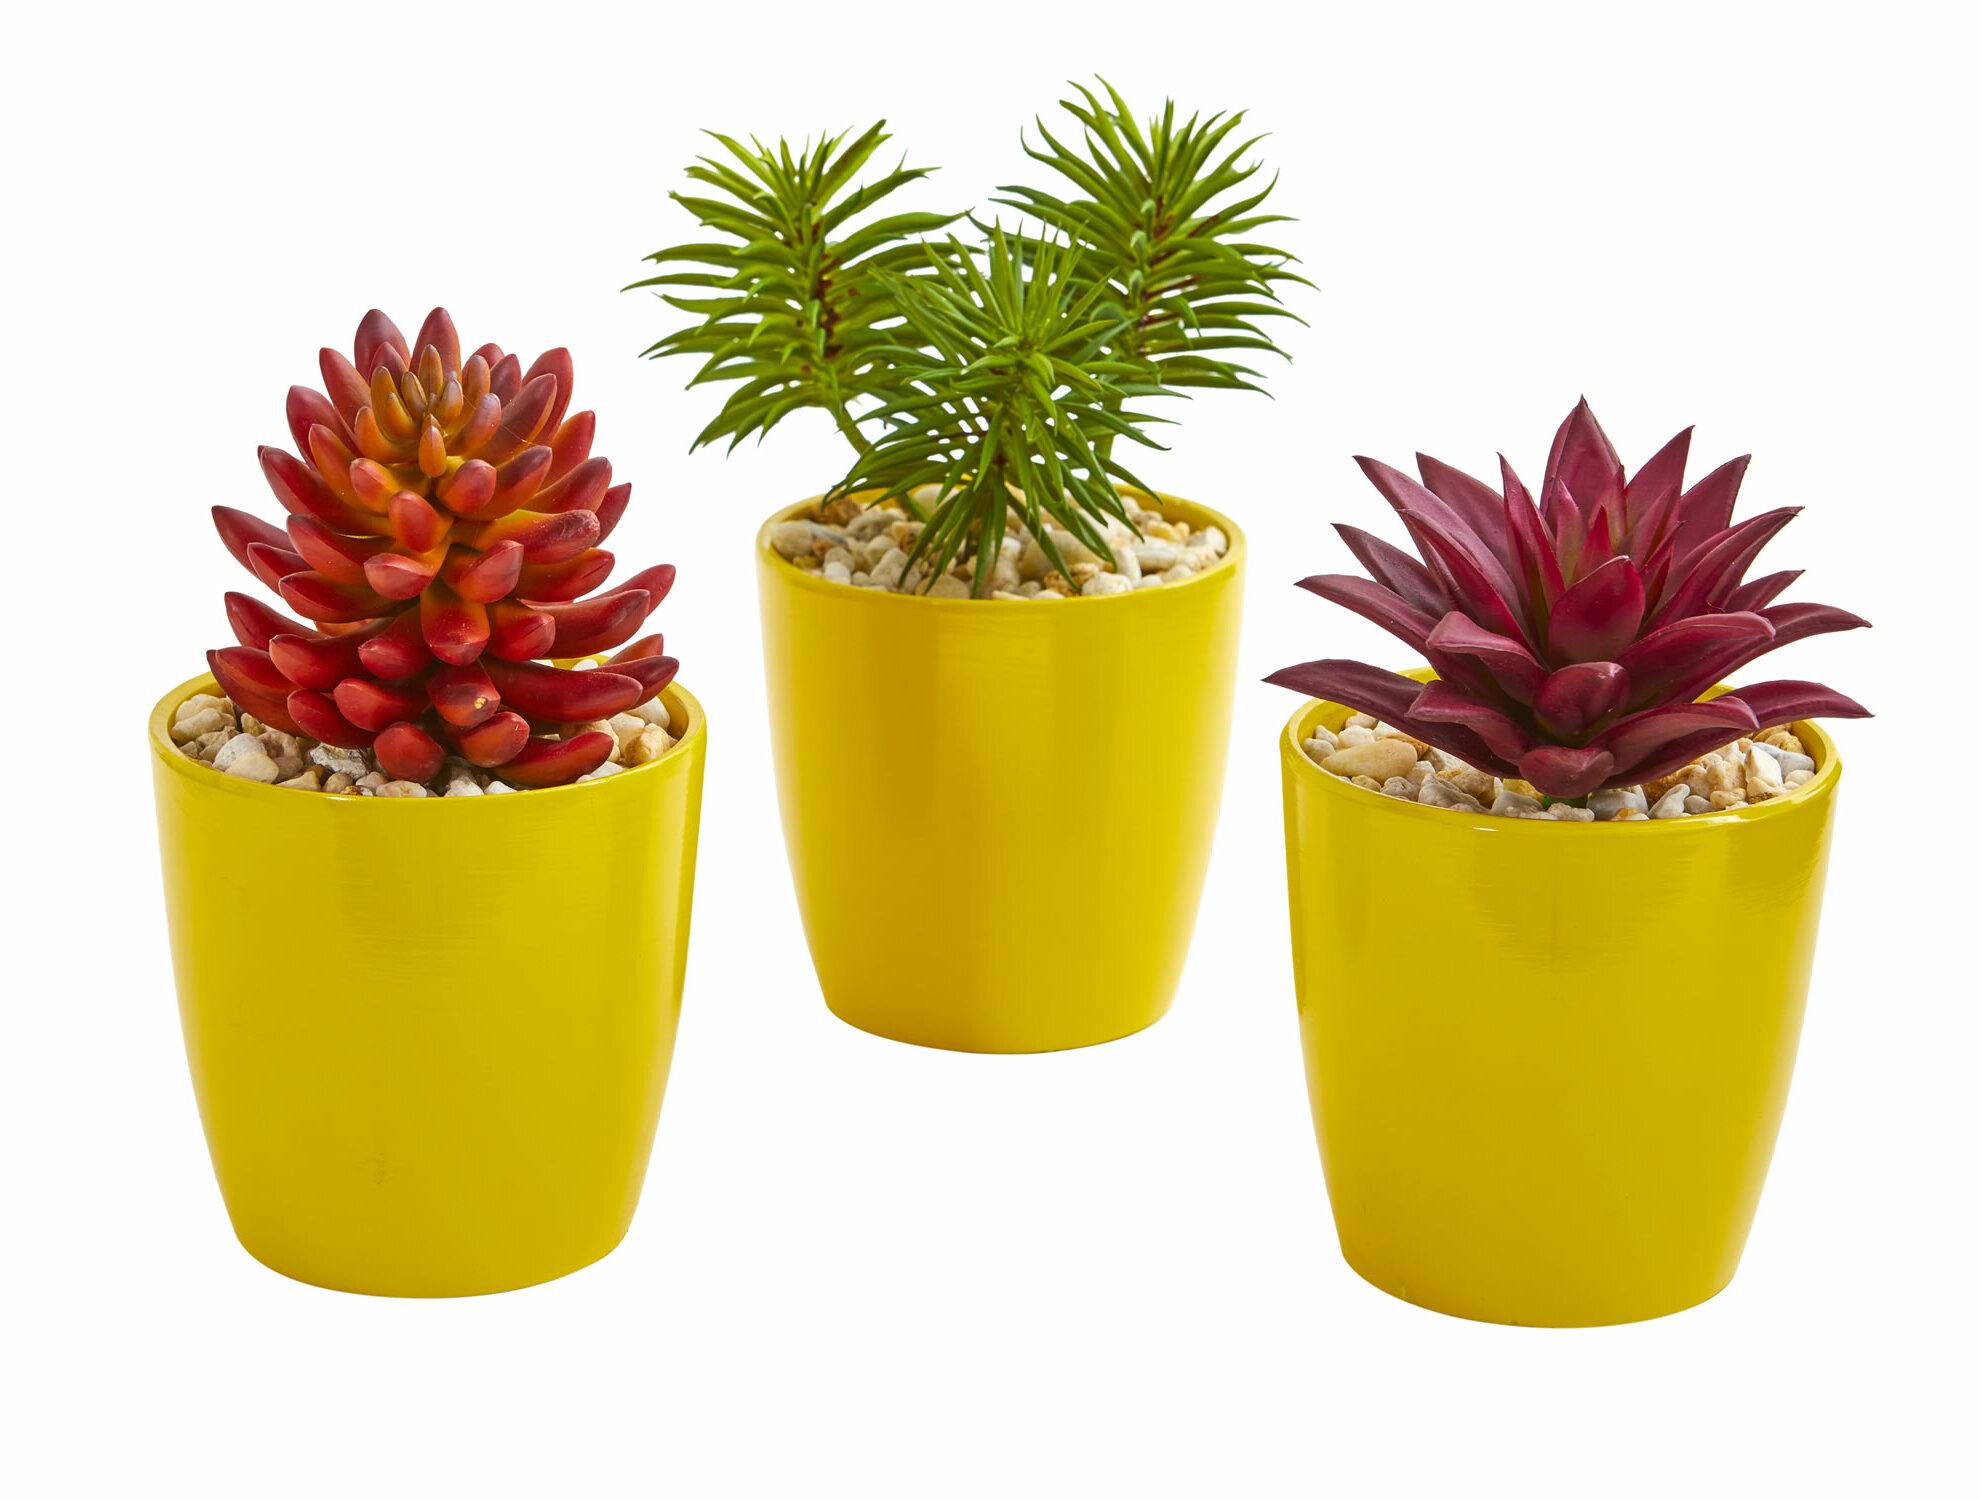 Primrue 3 Piece Artificial Mixed Cactus Succulent Plant In Decorative Vase Set Wayfair